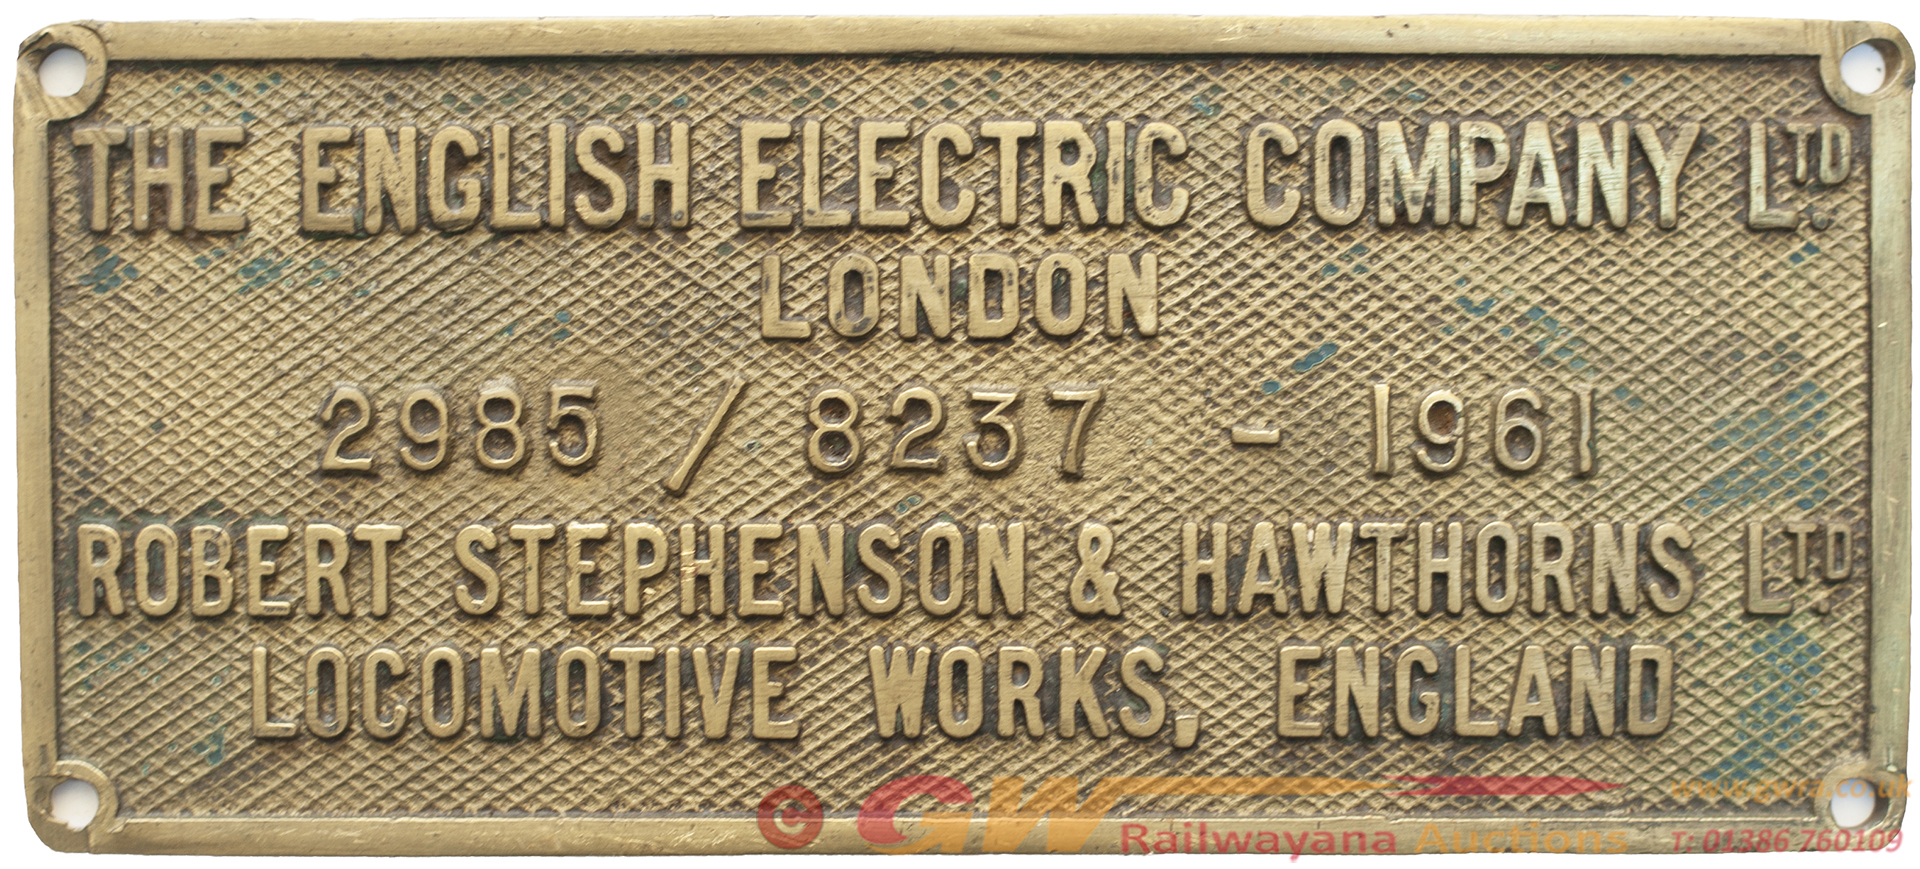 Worksplate THE ENGLISH ELECTRIC COMPANY LTD ROBERT